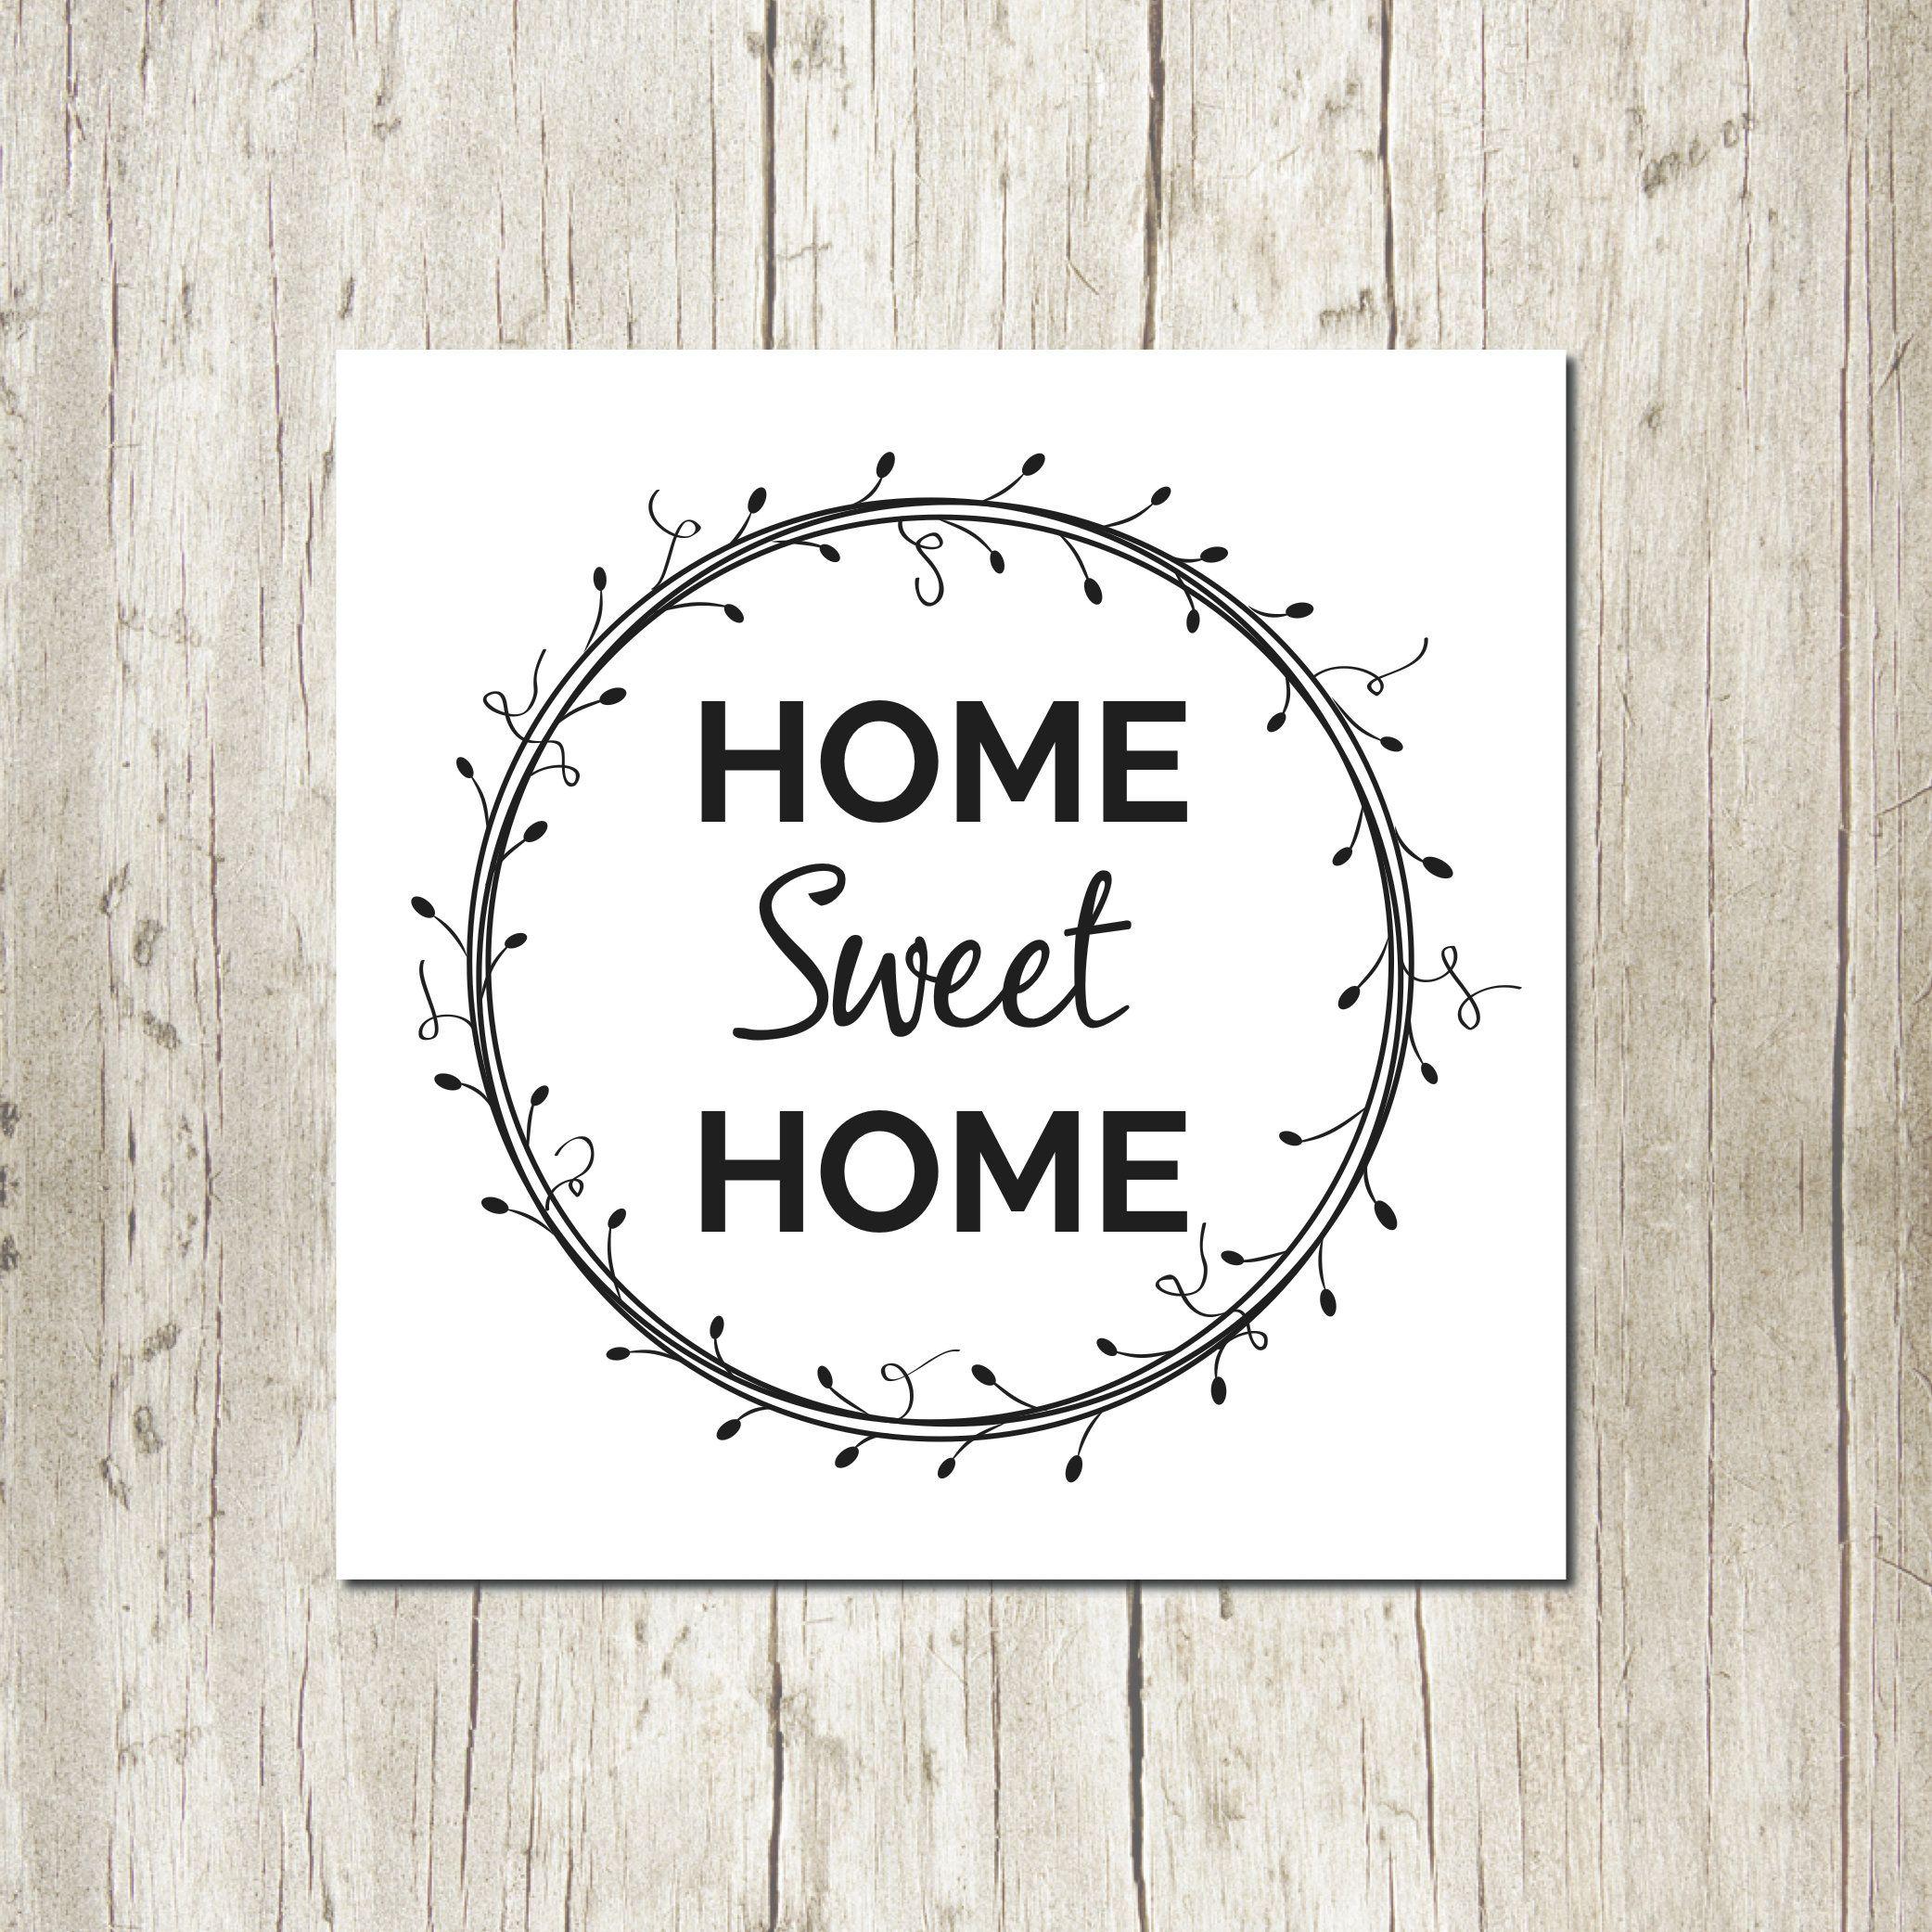 Home Sweet Home Sign Farmhouse Style Black Text White